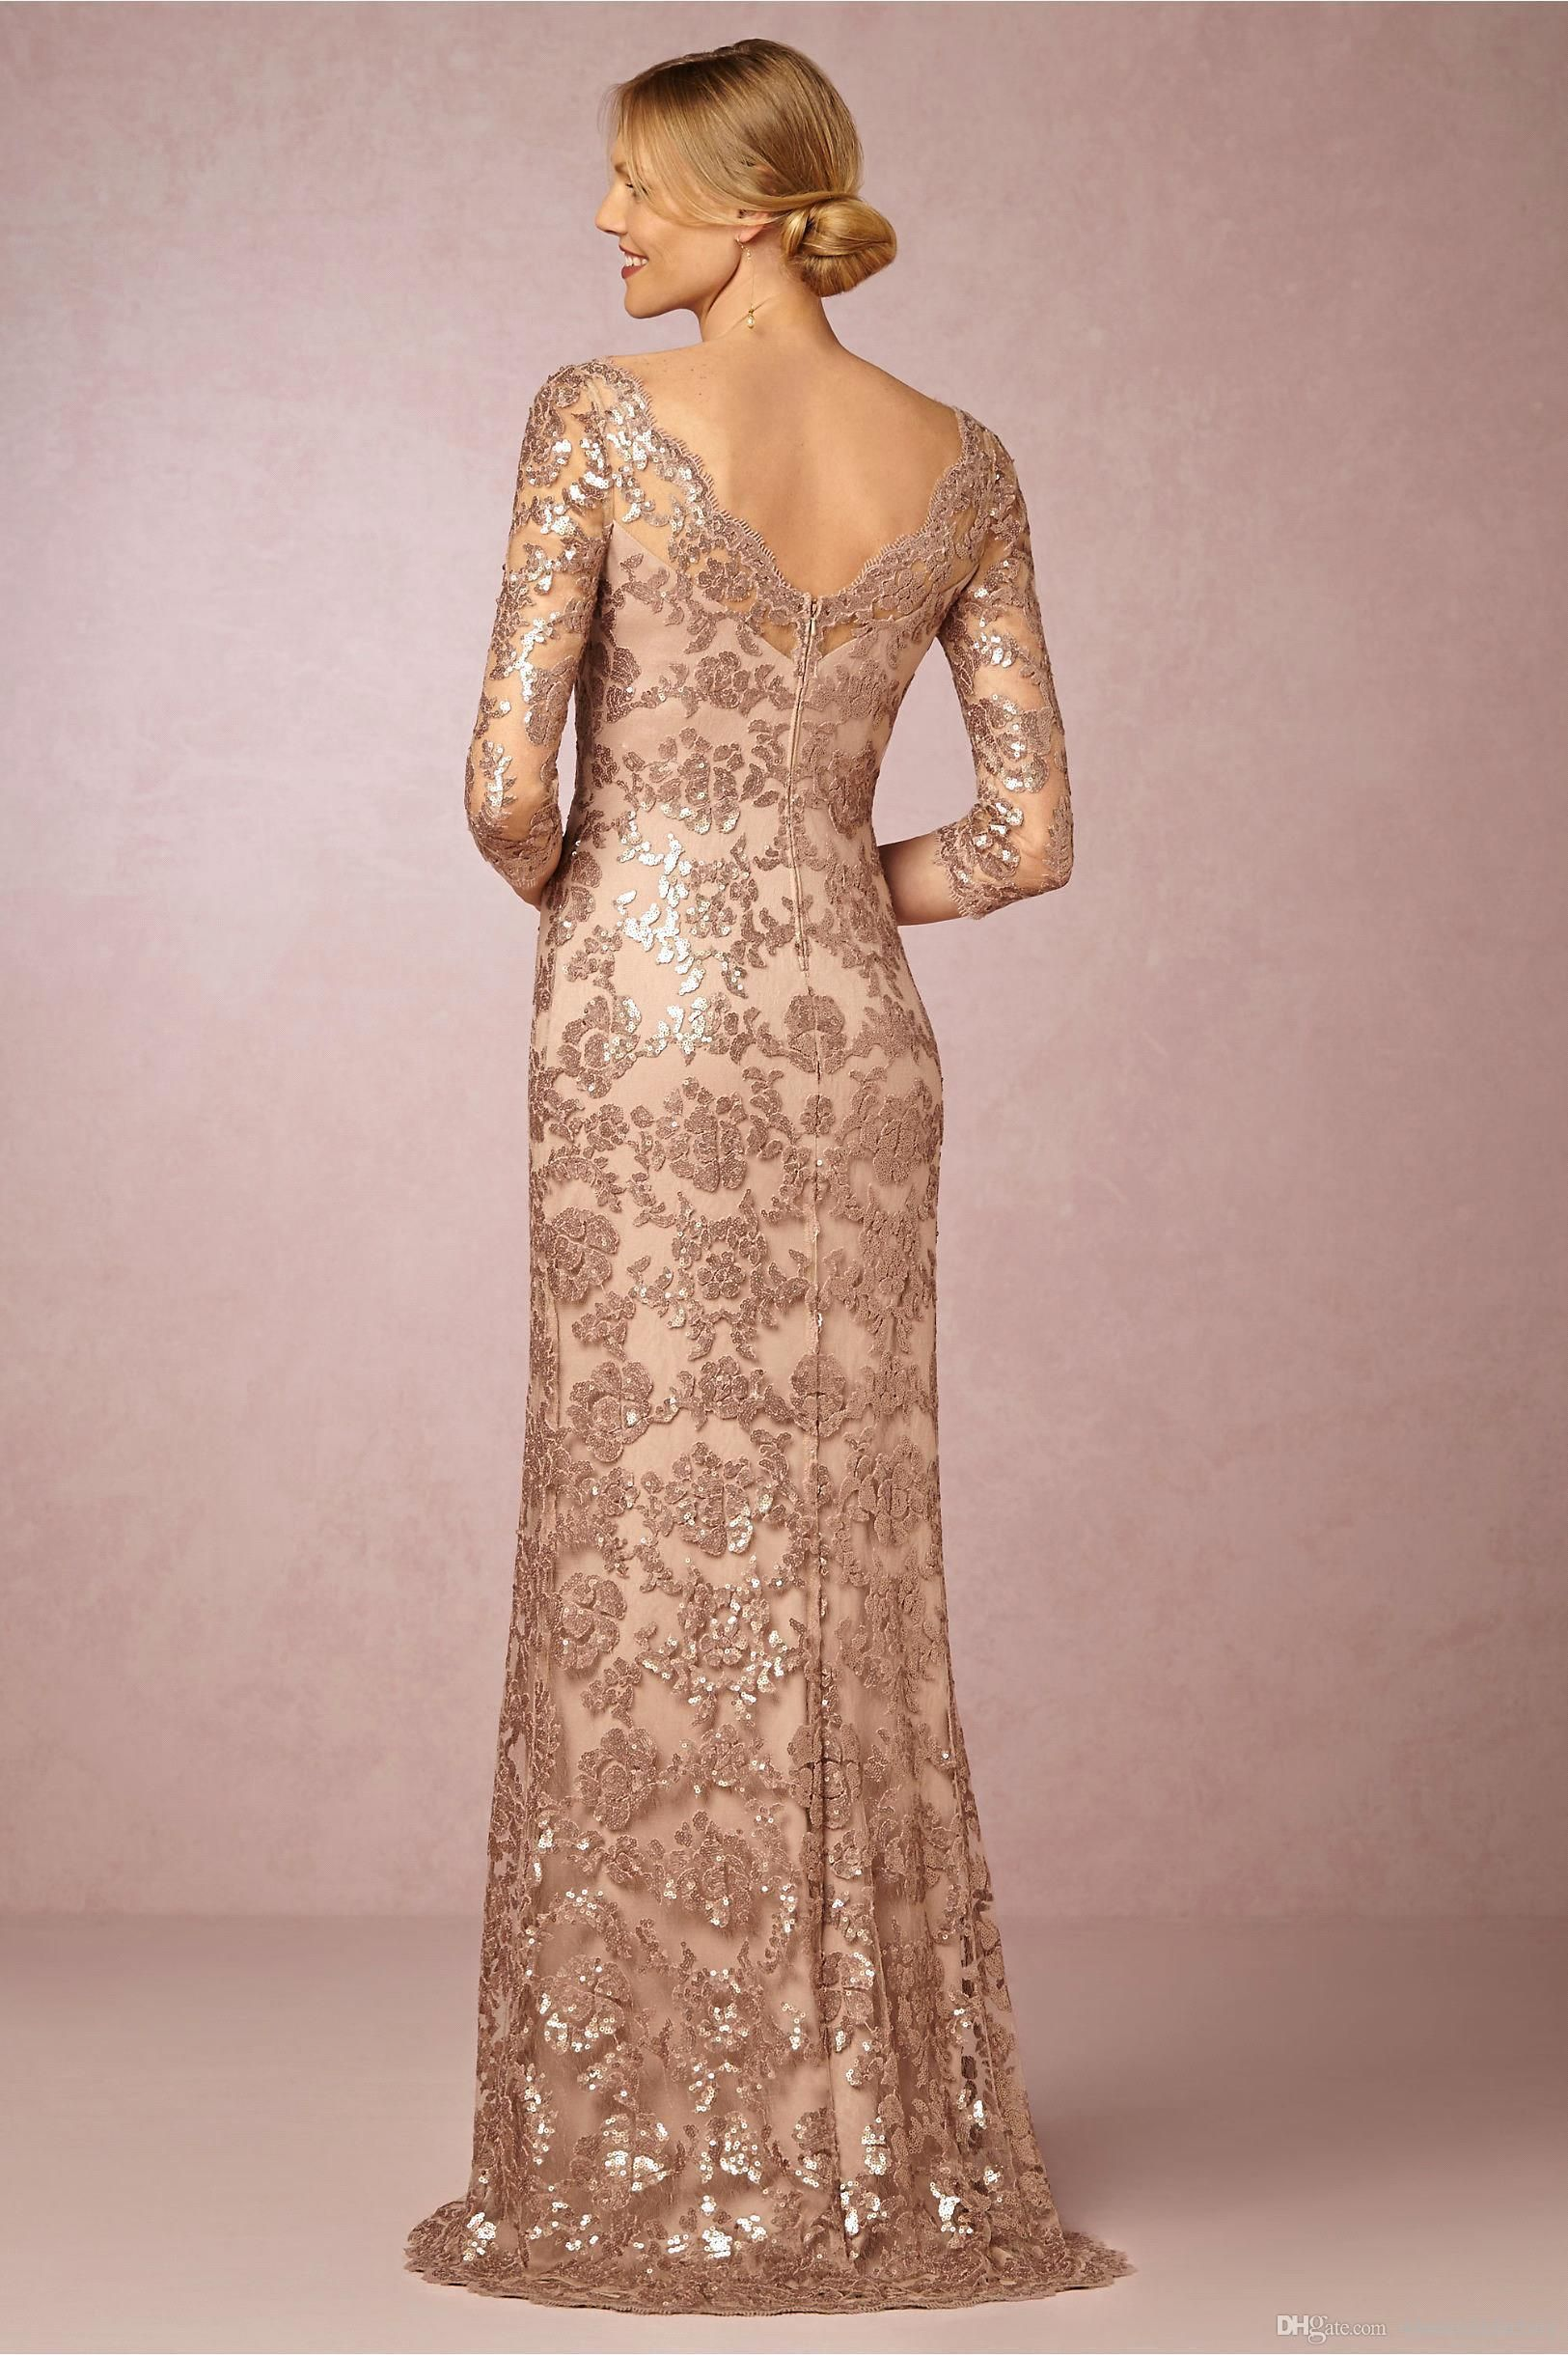 Long sleeves rose gold mother of the bride groom dresses bateau neck